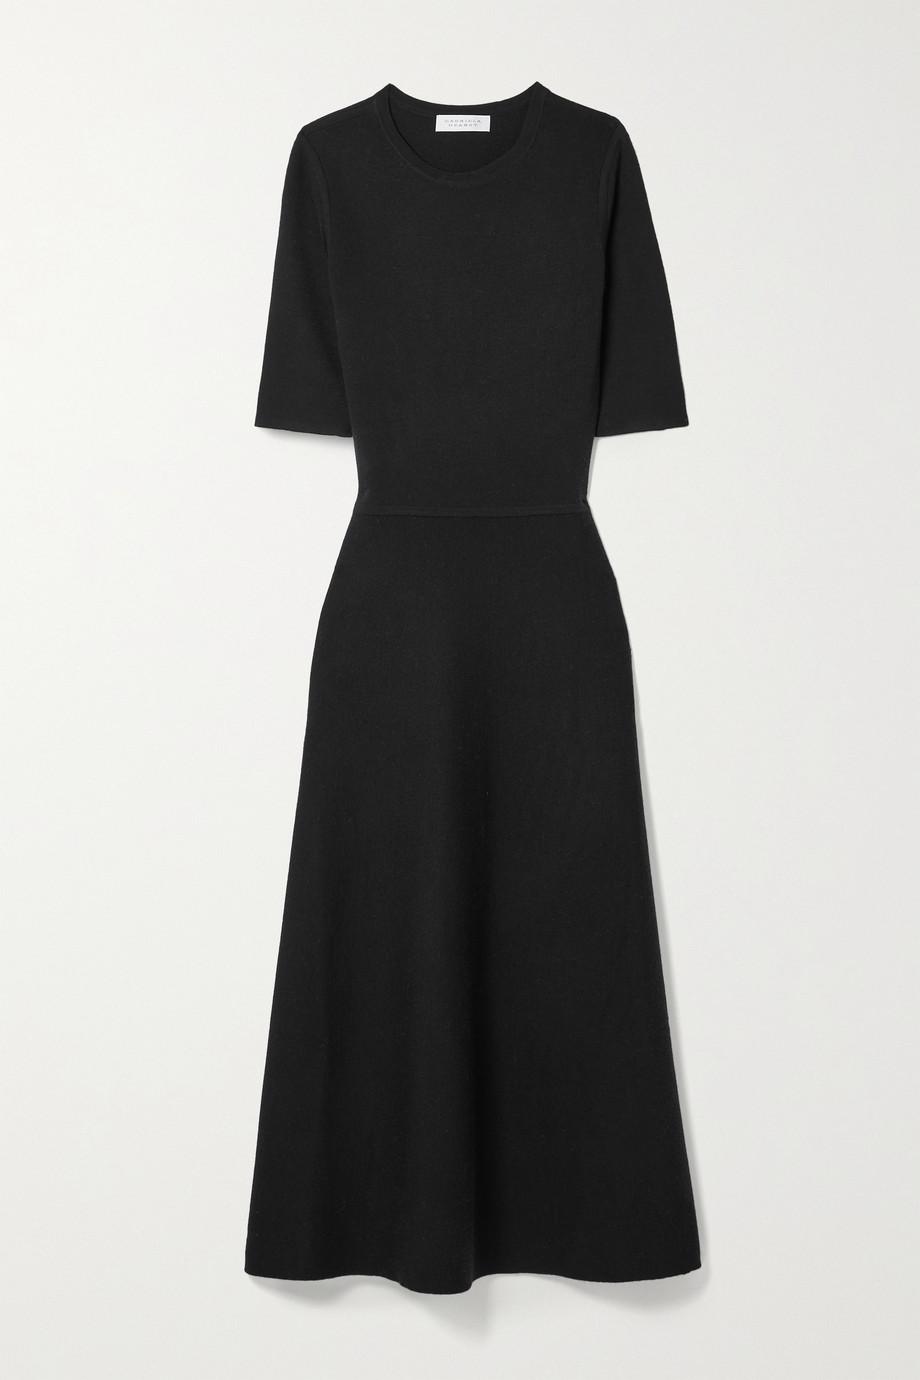 Gabriela Hearst Seymore wool, cashmere and silk-blend midi dress